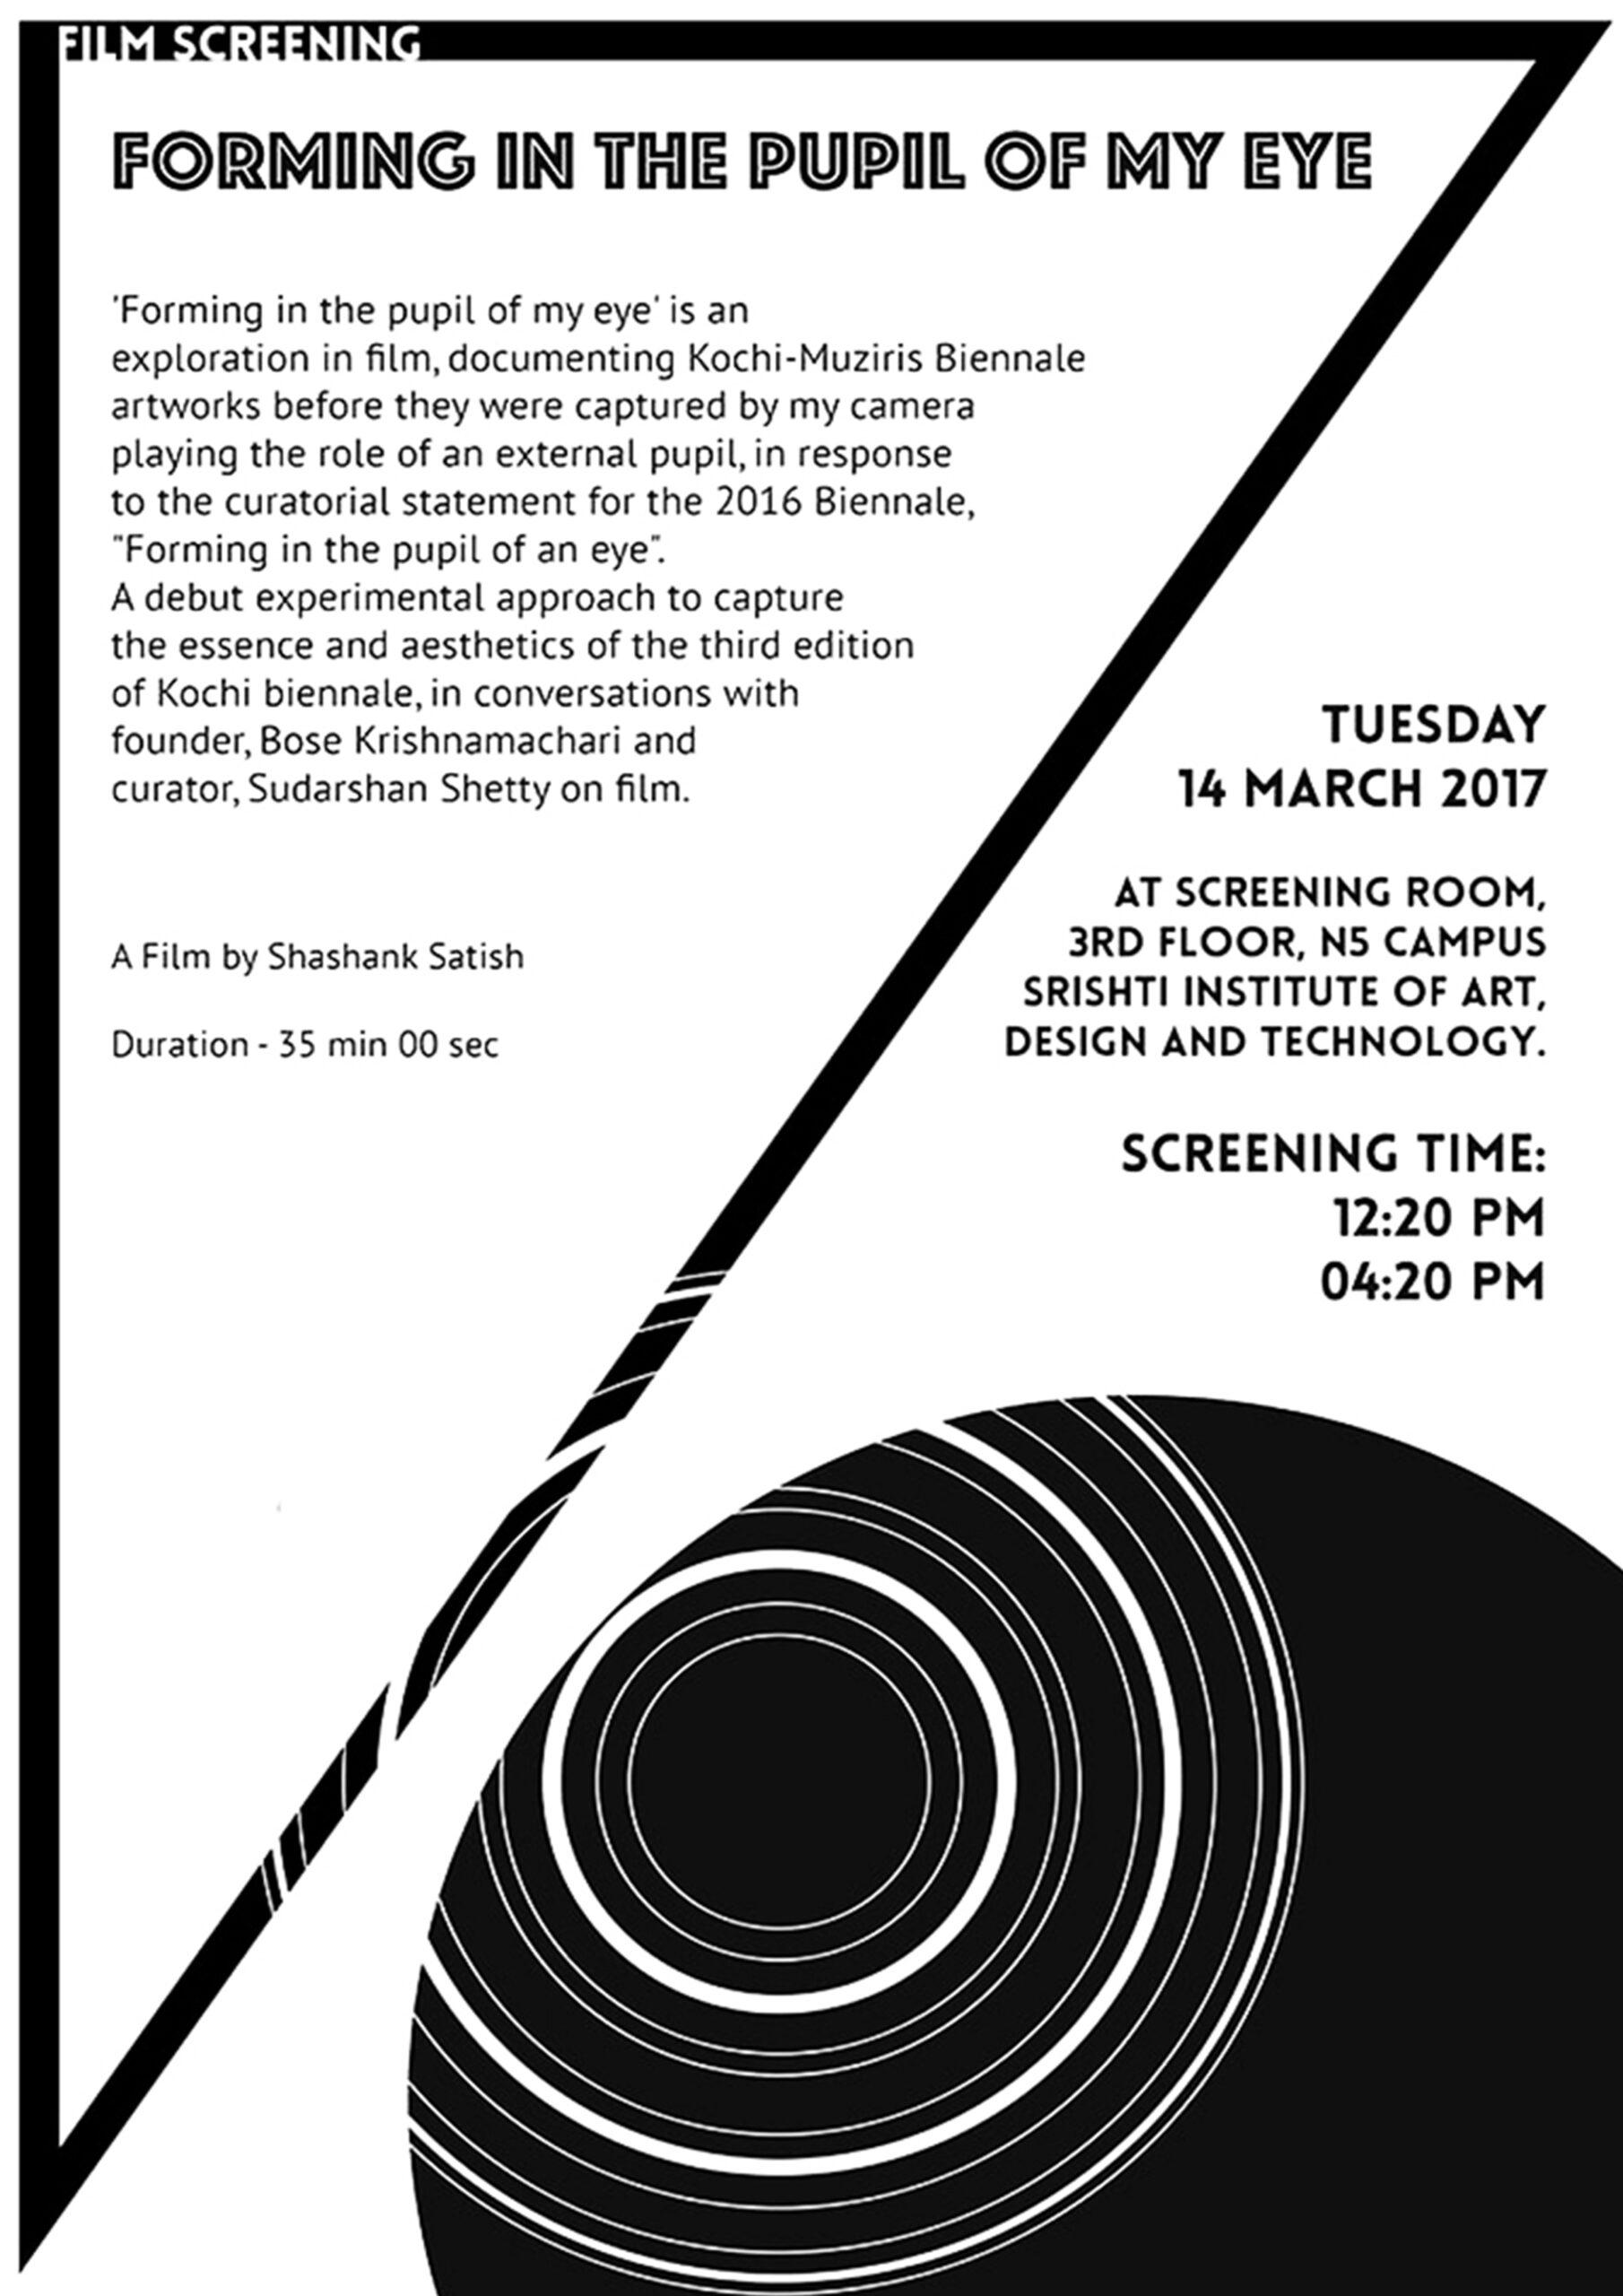 Film-screening_poster